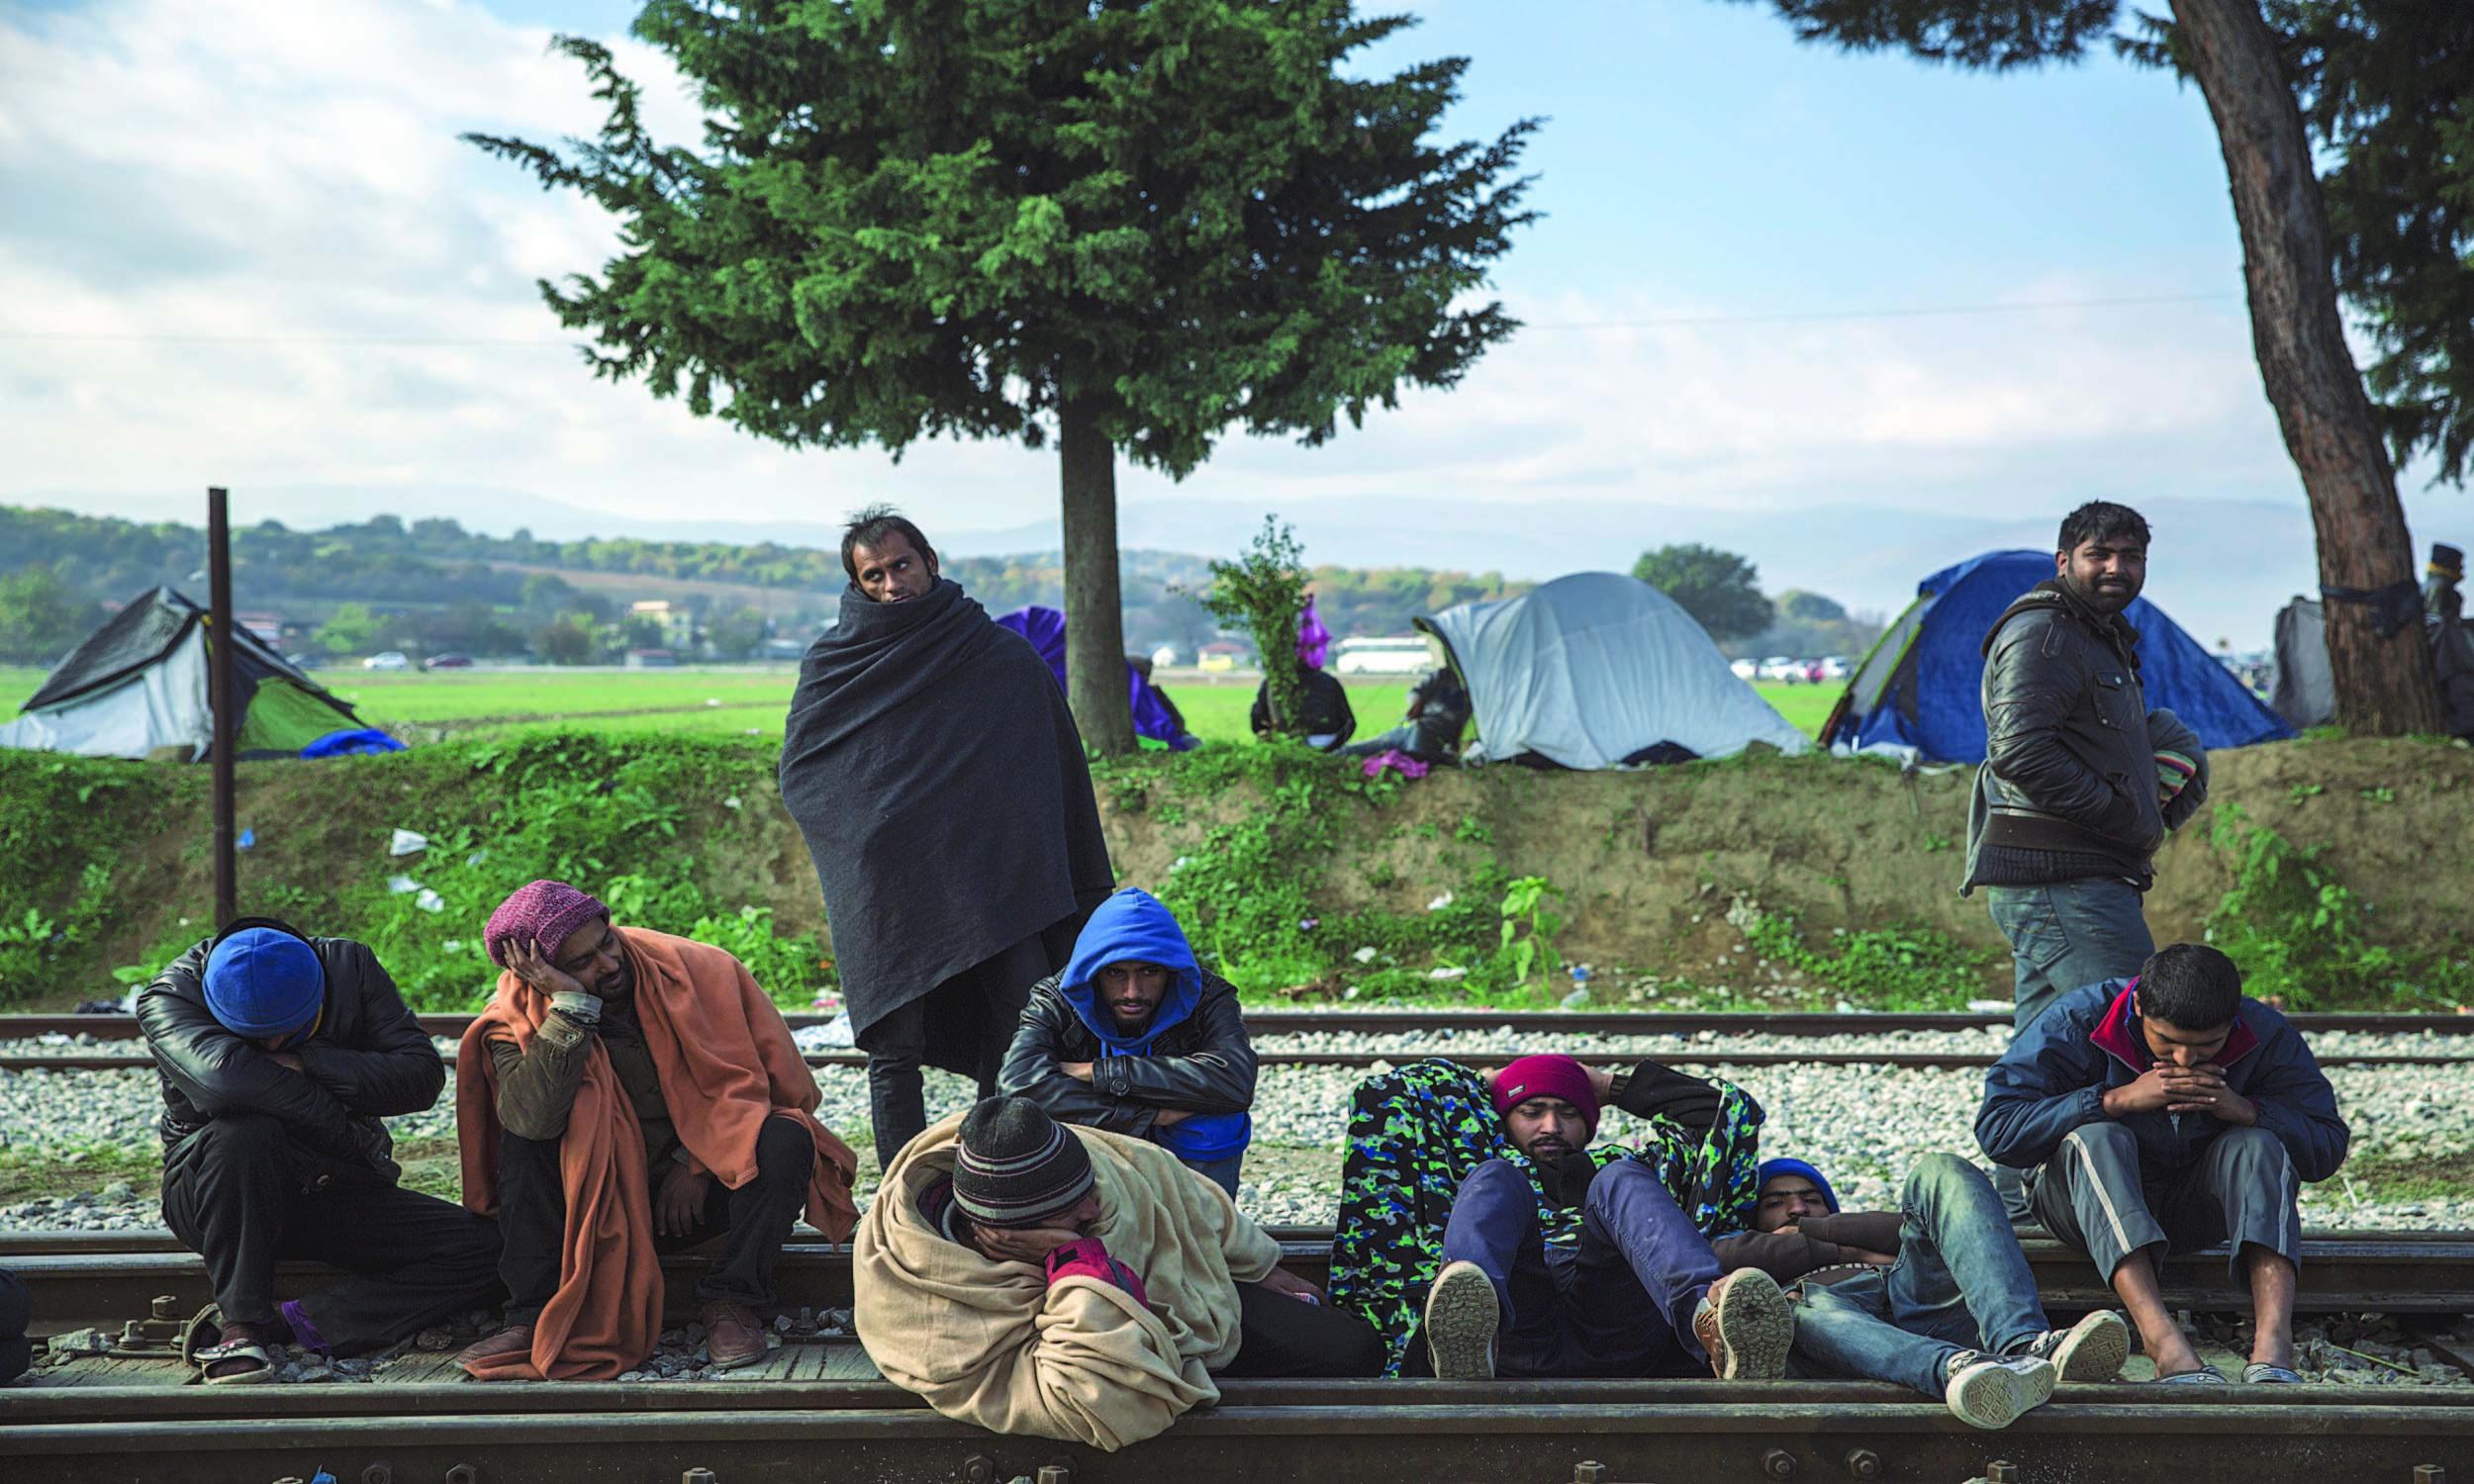 Pakistani migrants stranded in Greece sleep on the train tracks at Idomeni, an informal camp on the Macedonian border | Jodi Hilton